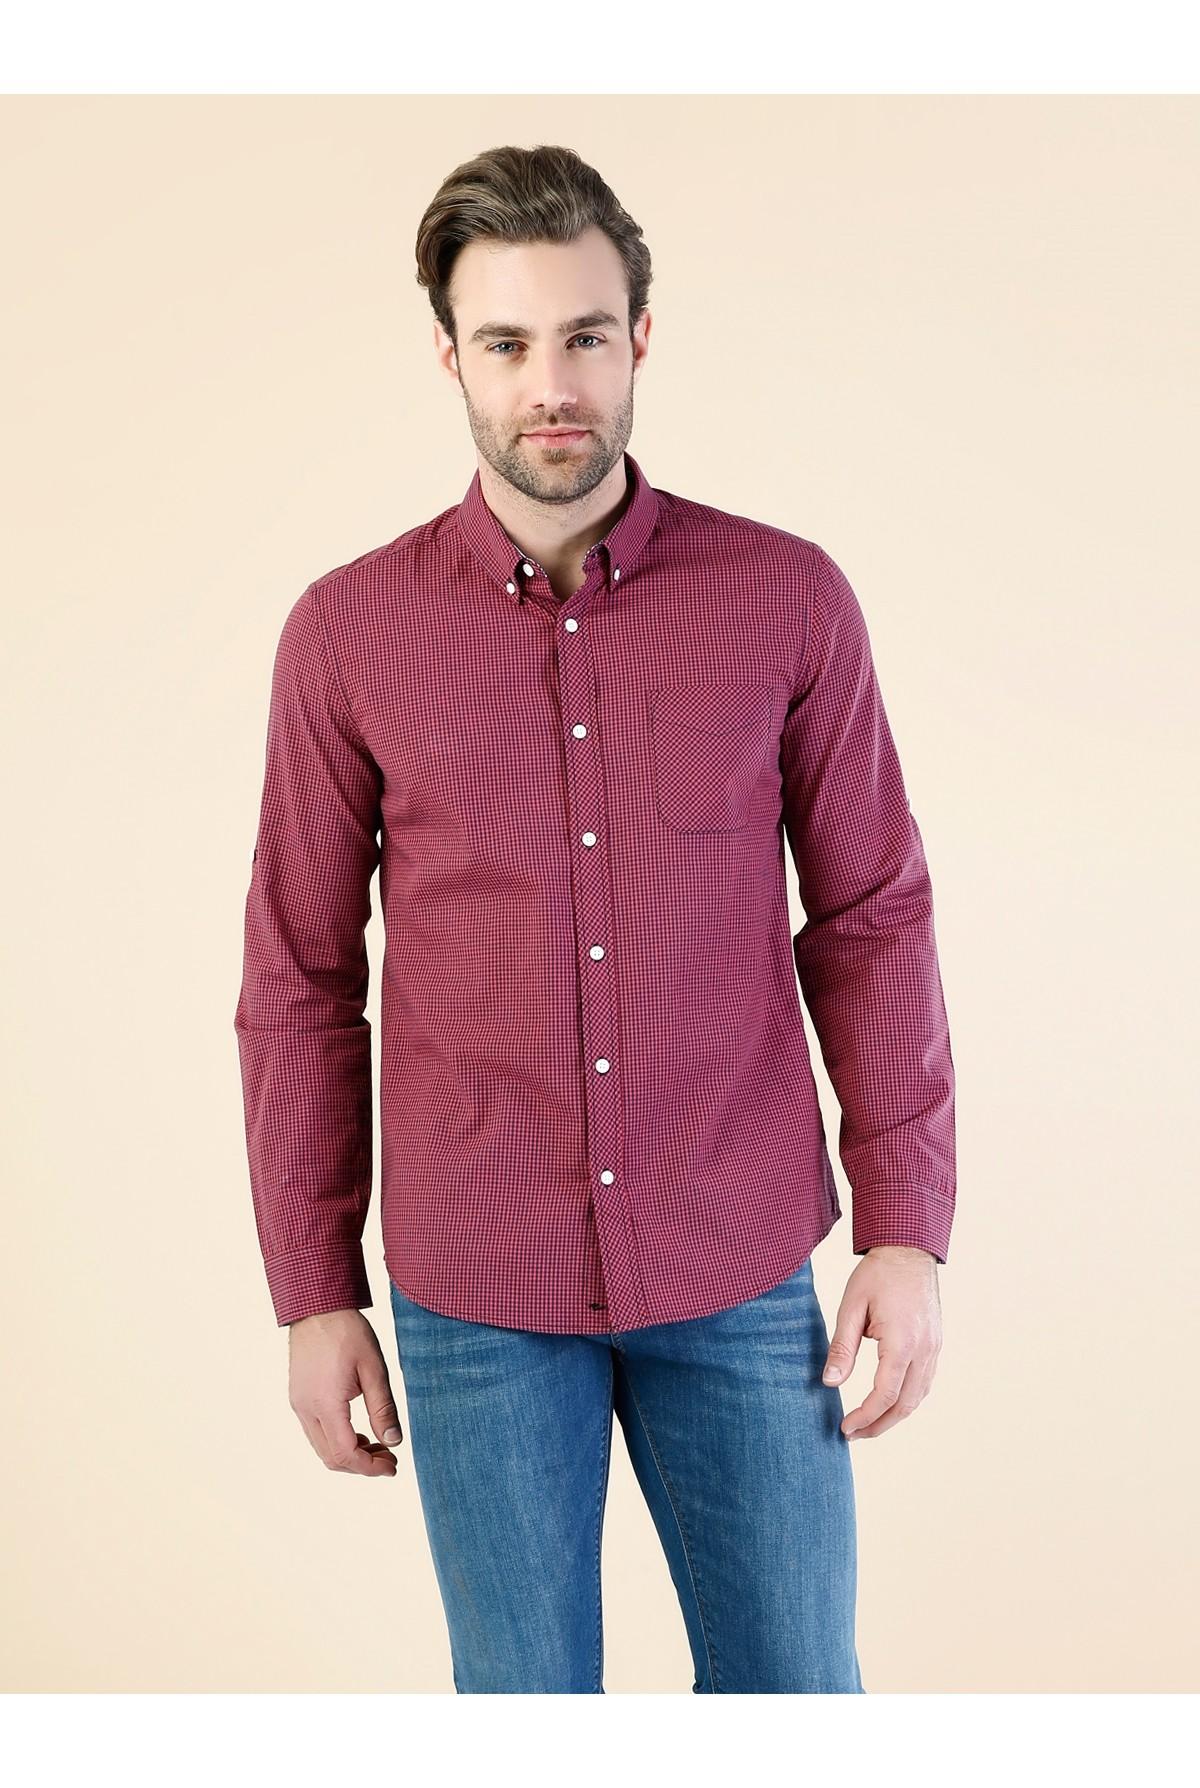 بالصور قميص رجالي , اسرار اناقة الرجال 594 4